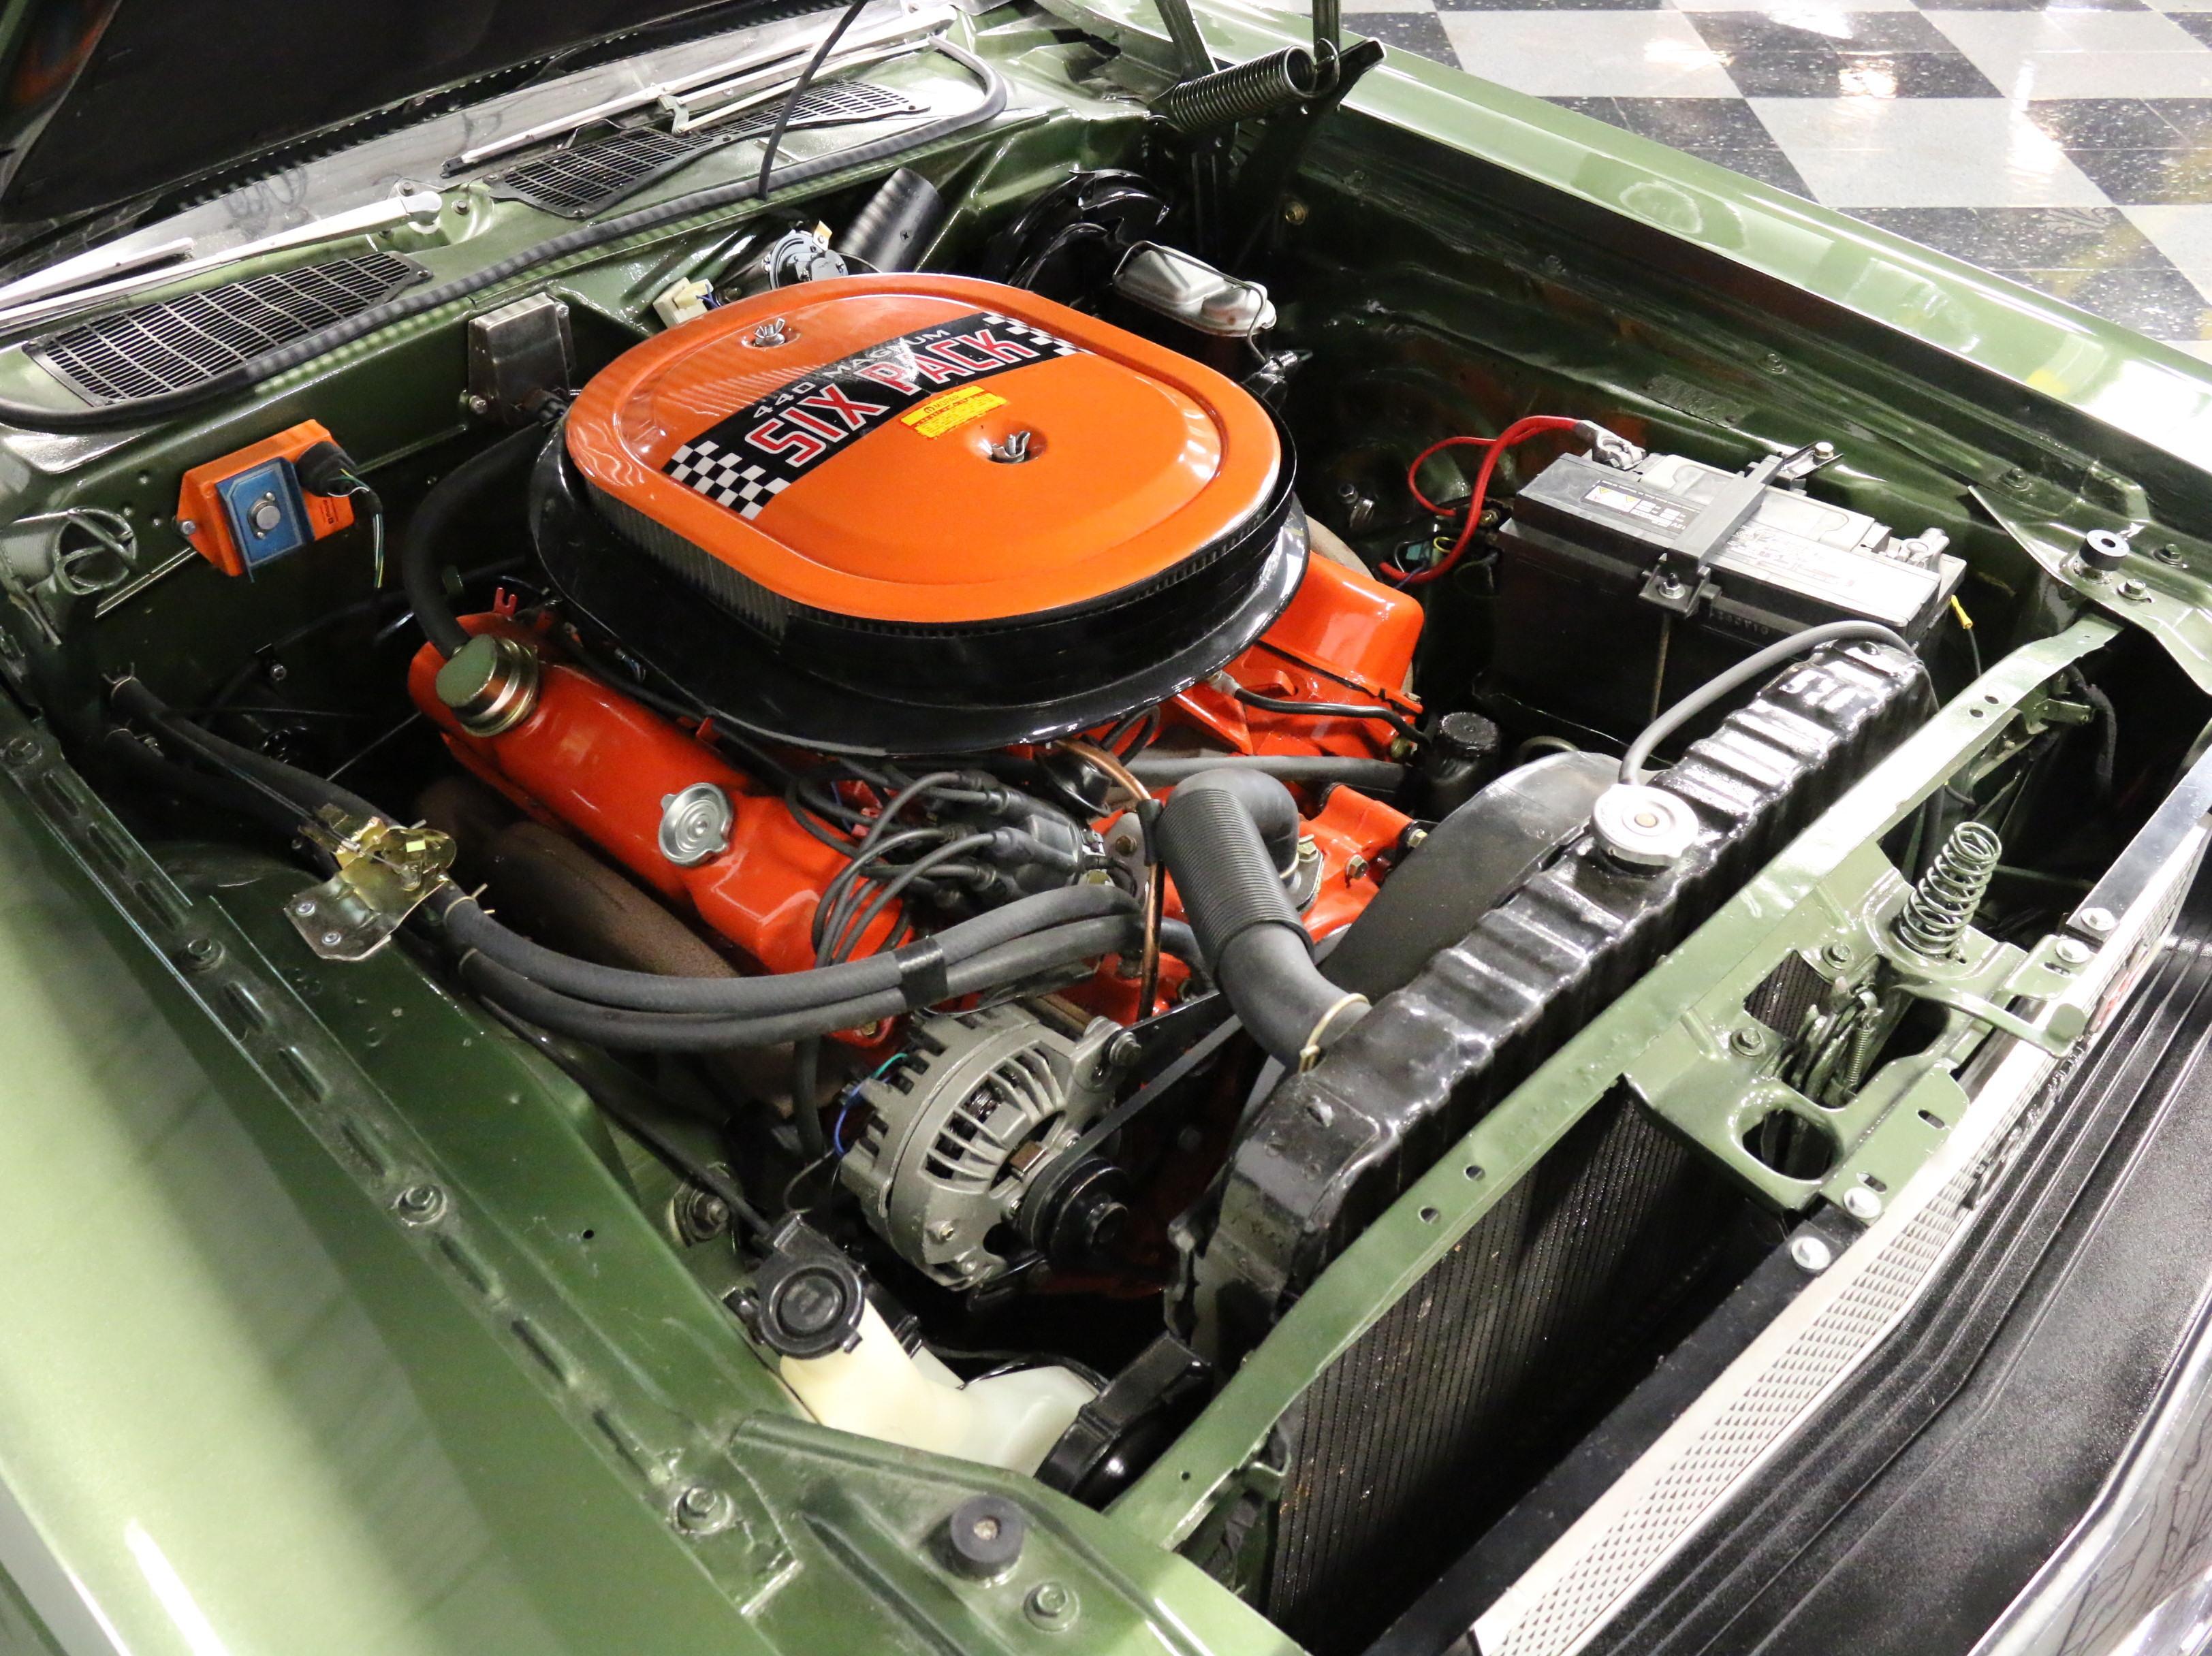 2551-DFW | 1970 Dodge Challenger R/T 440 Six-Pack | Streetside Classics